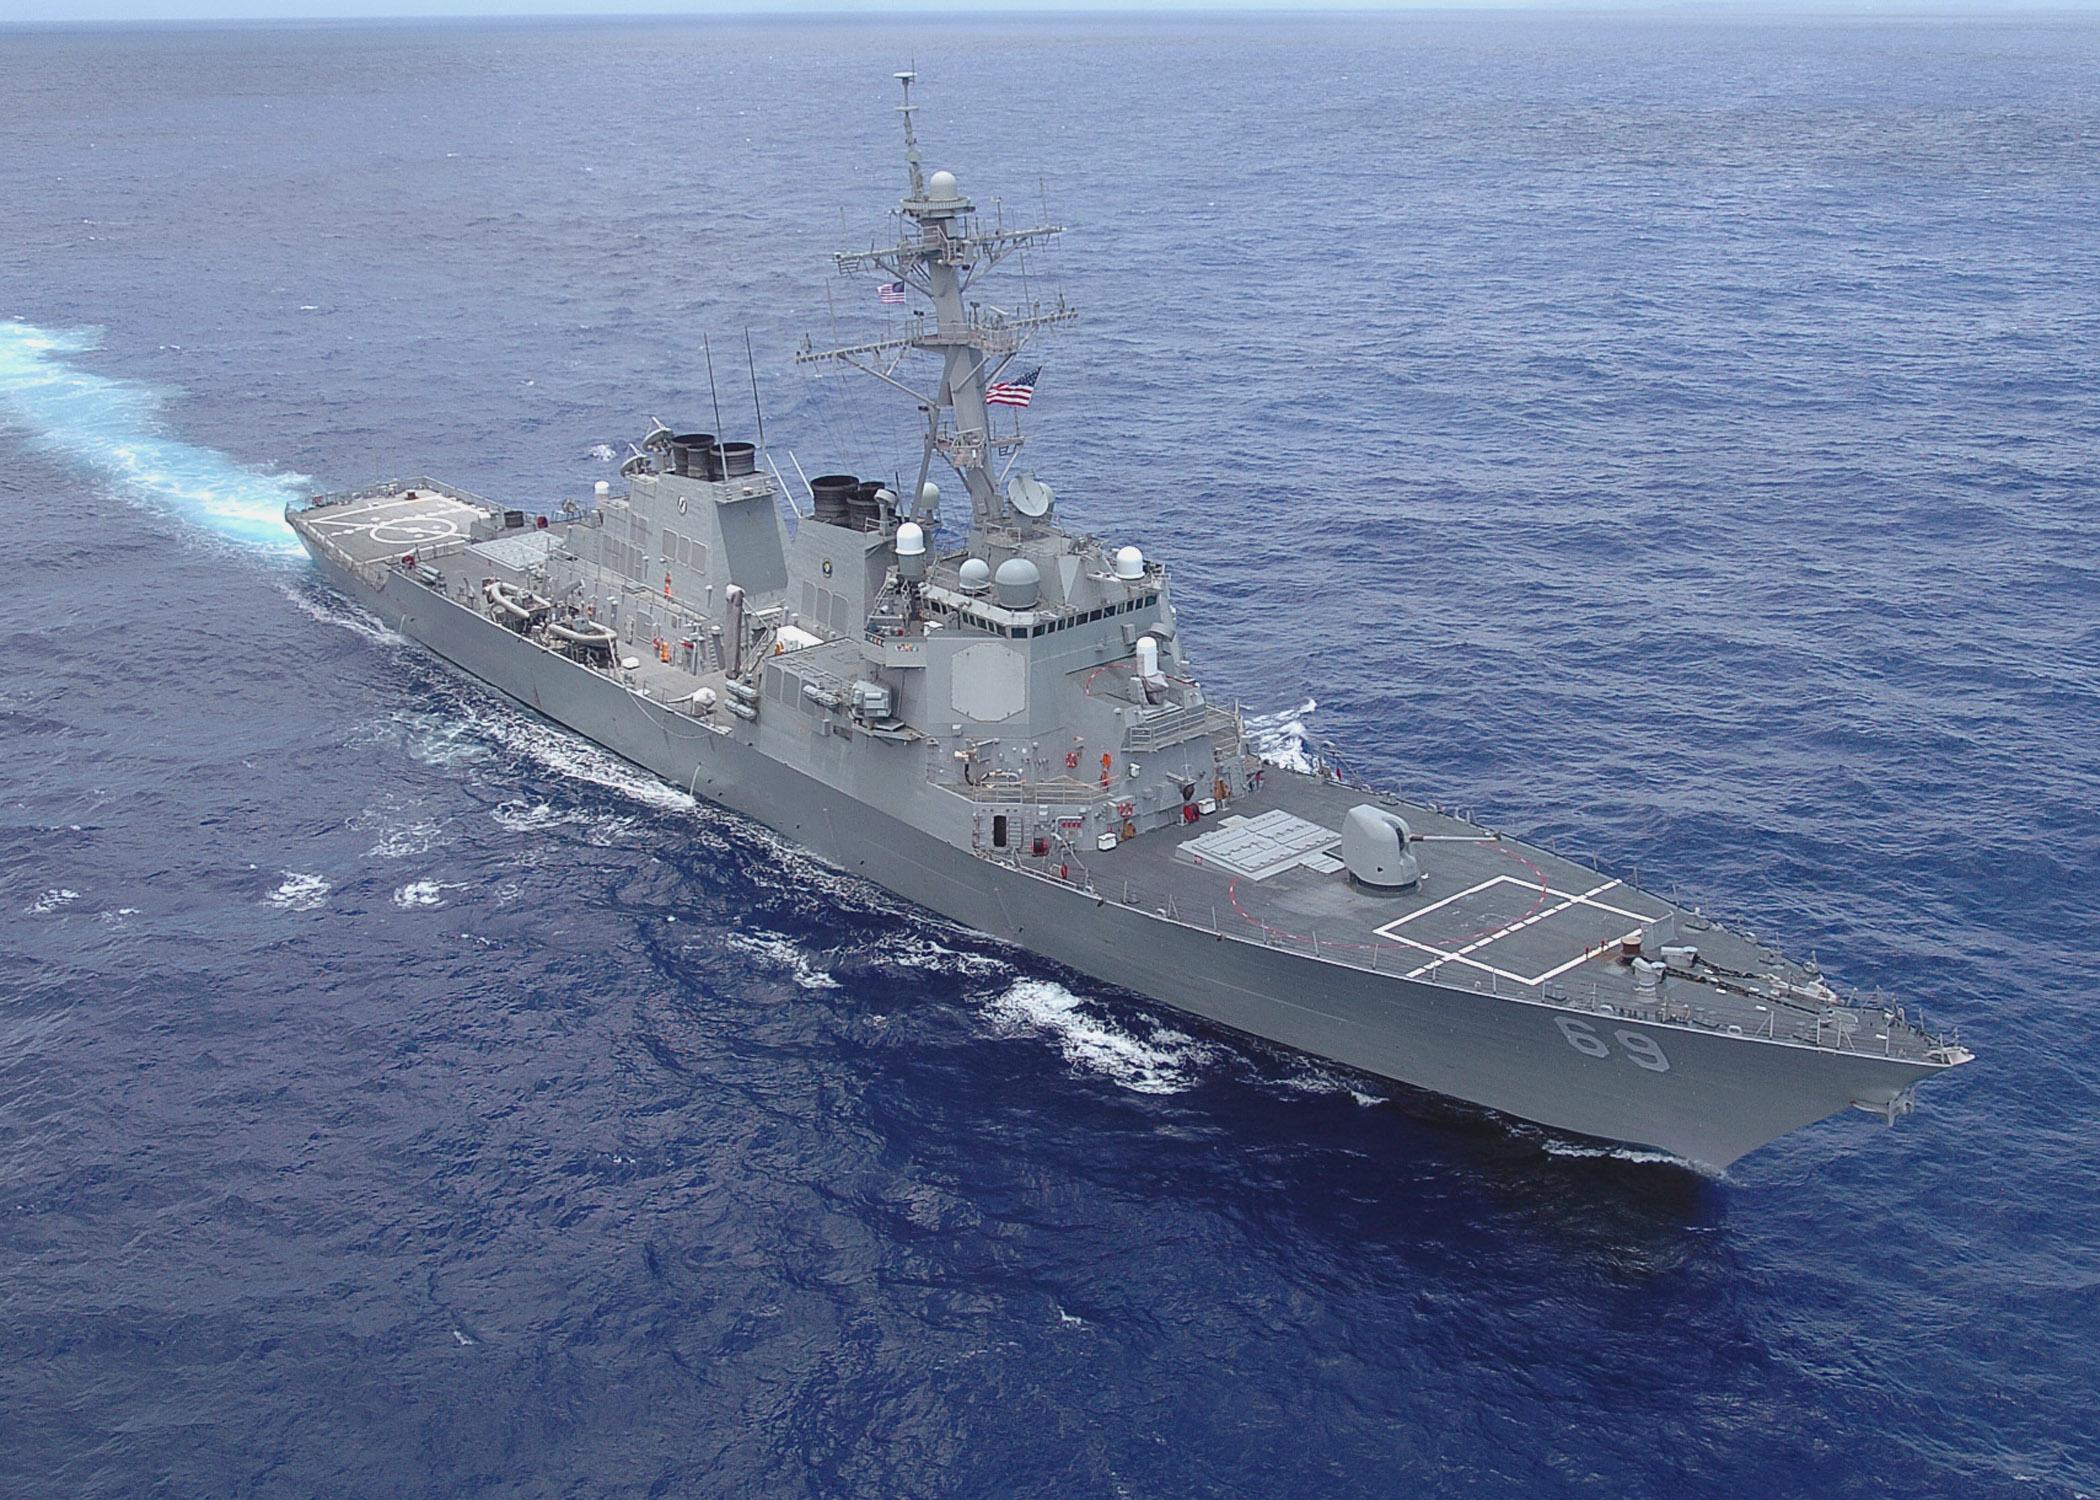 http://upload.wikimedia.org/wikipedia/commons/9/95/USS_Milius_DDG69.jpg